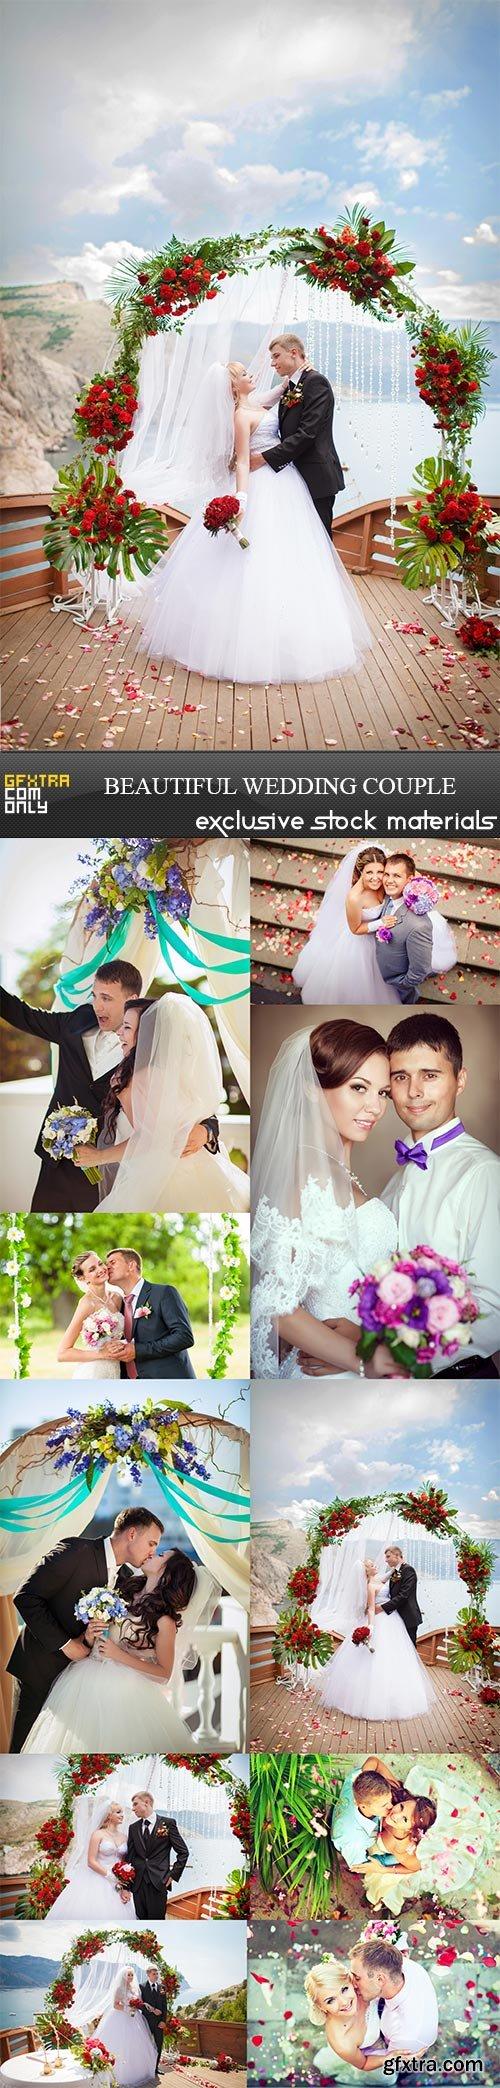 Beautiful wedding couple, 10 x UHQ JPEG